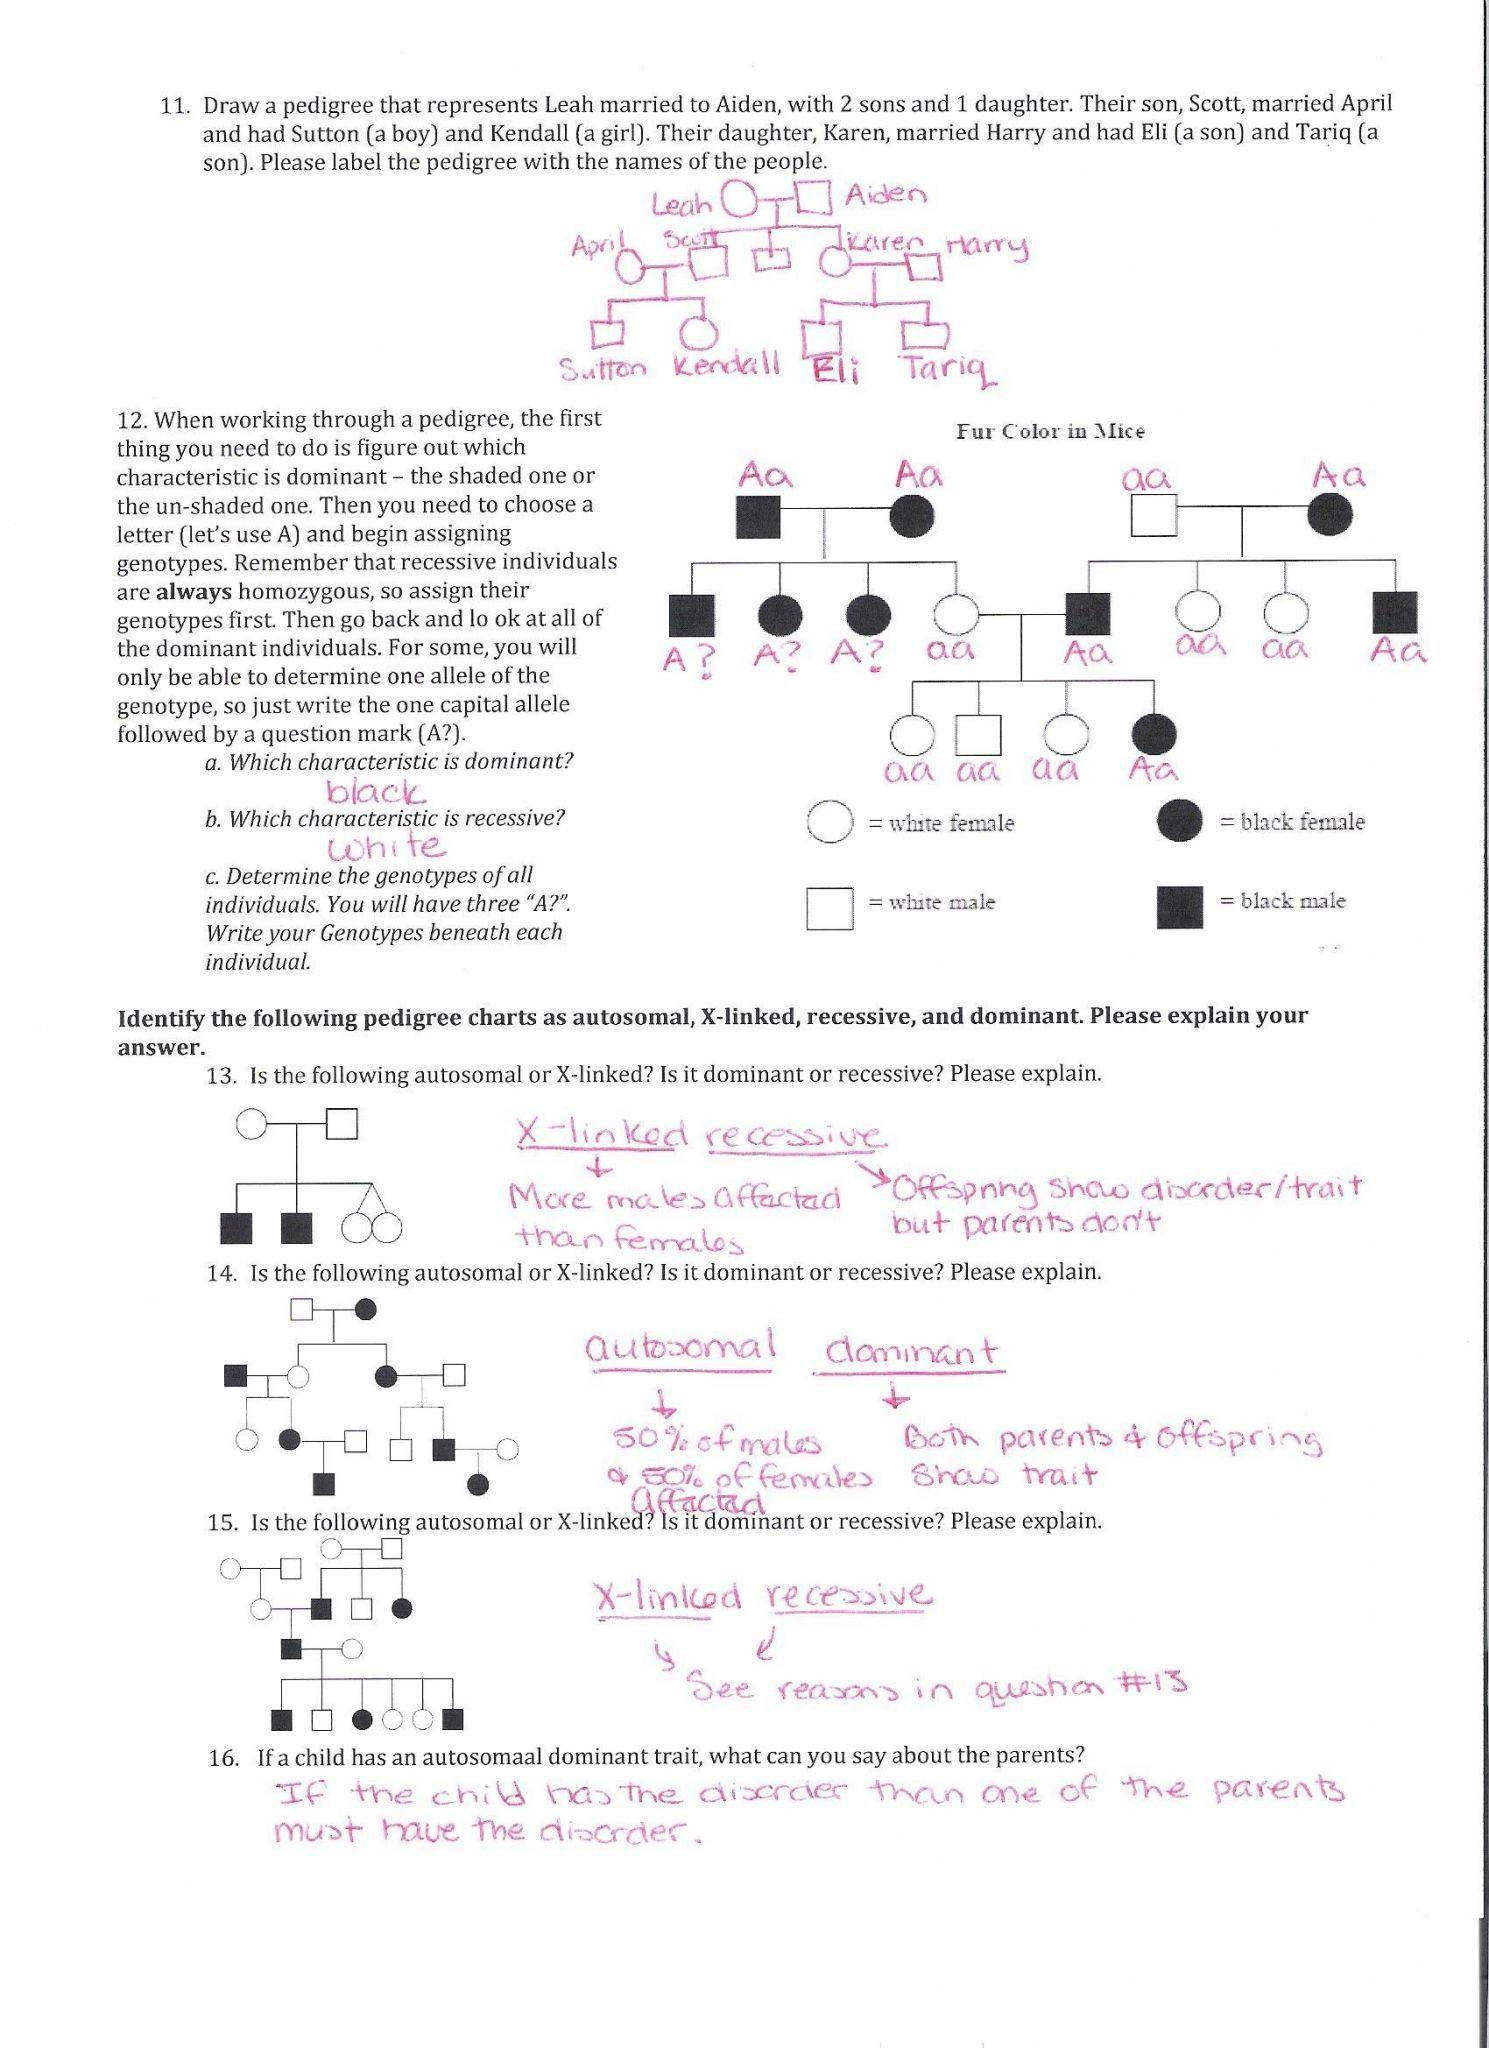 Pedigree Worksheet Answer Key Genetics Pedigree Worksheet Answer Key with Images